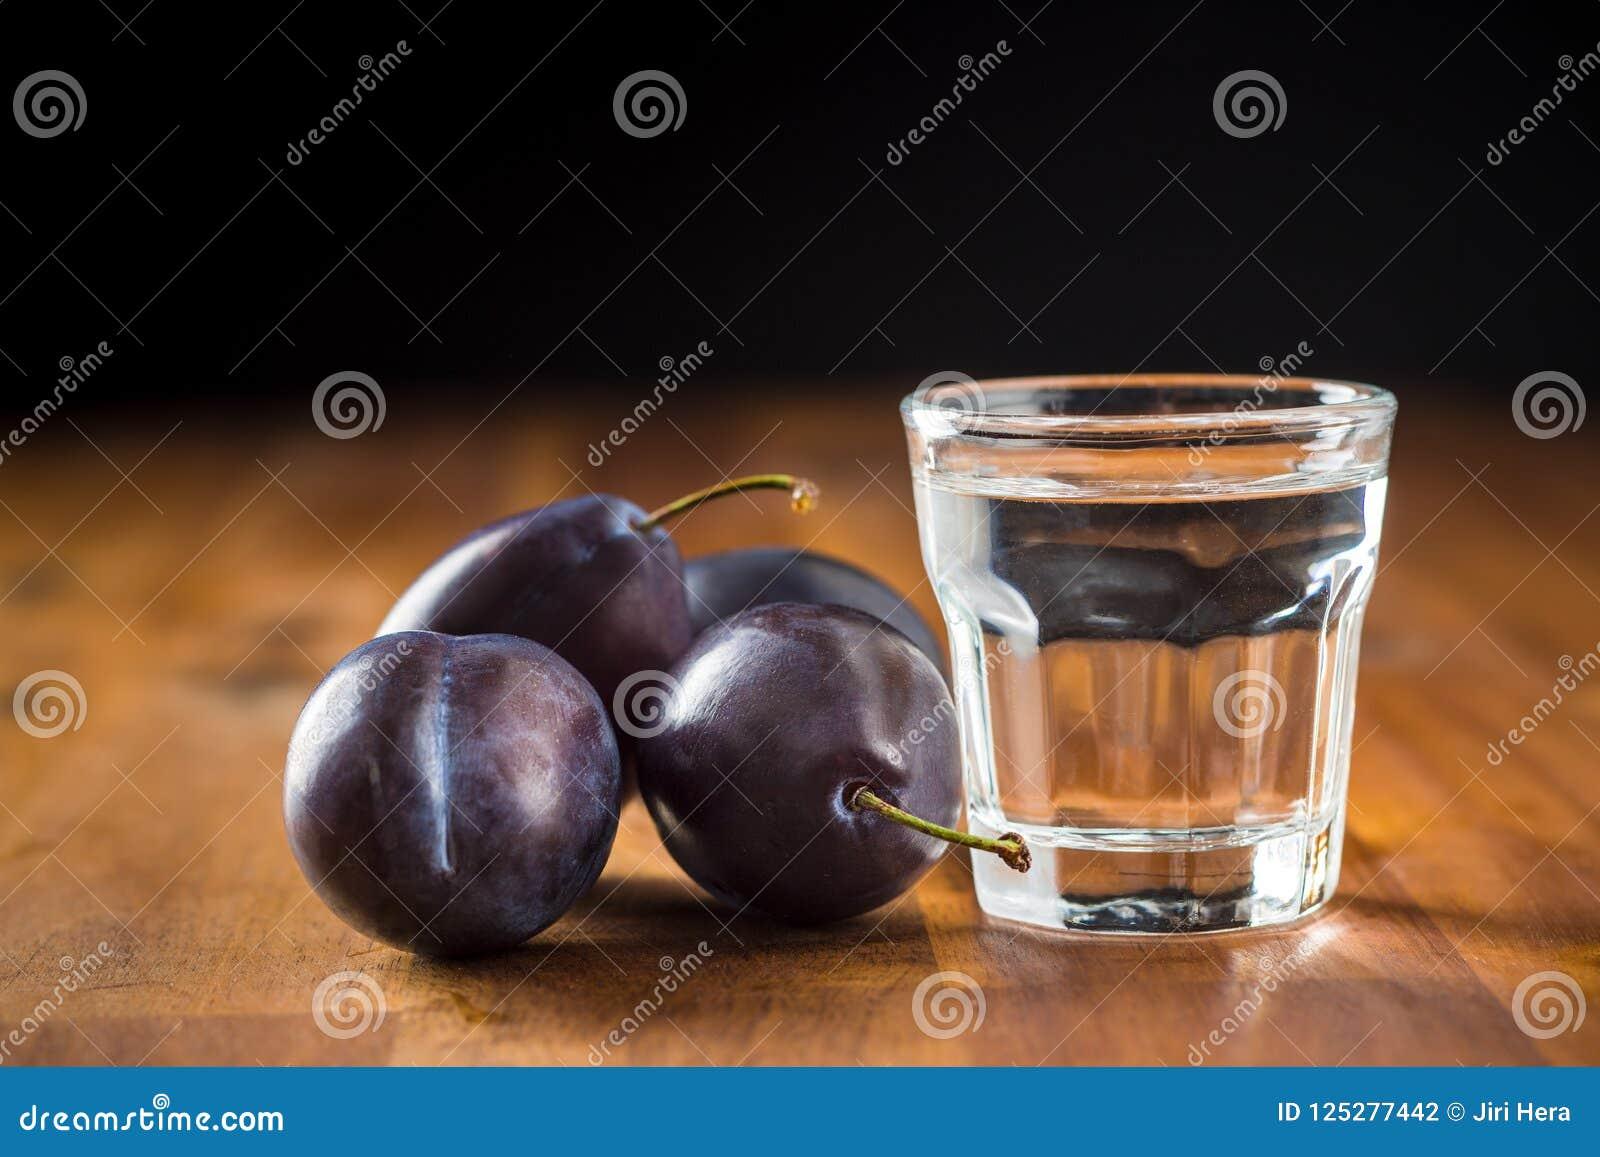 Plum brandy and plums. Slivovitz.